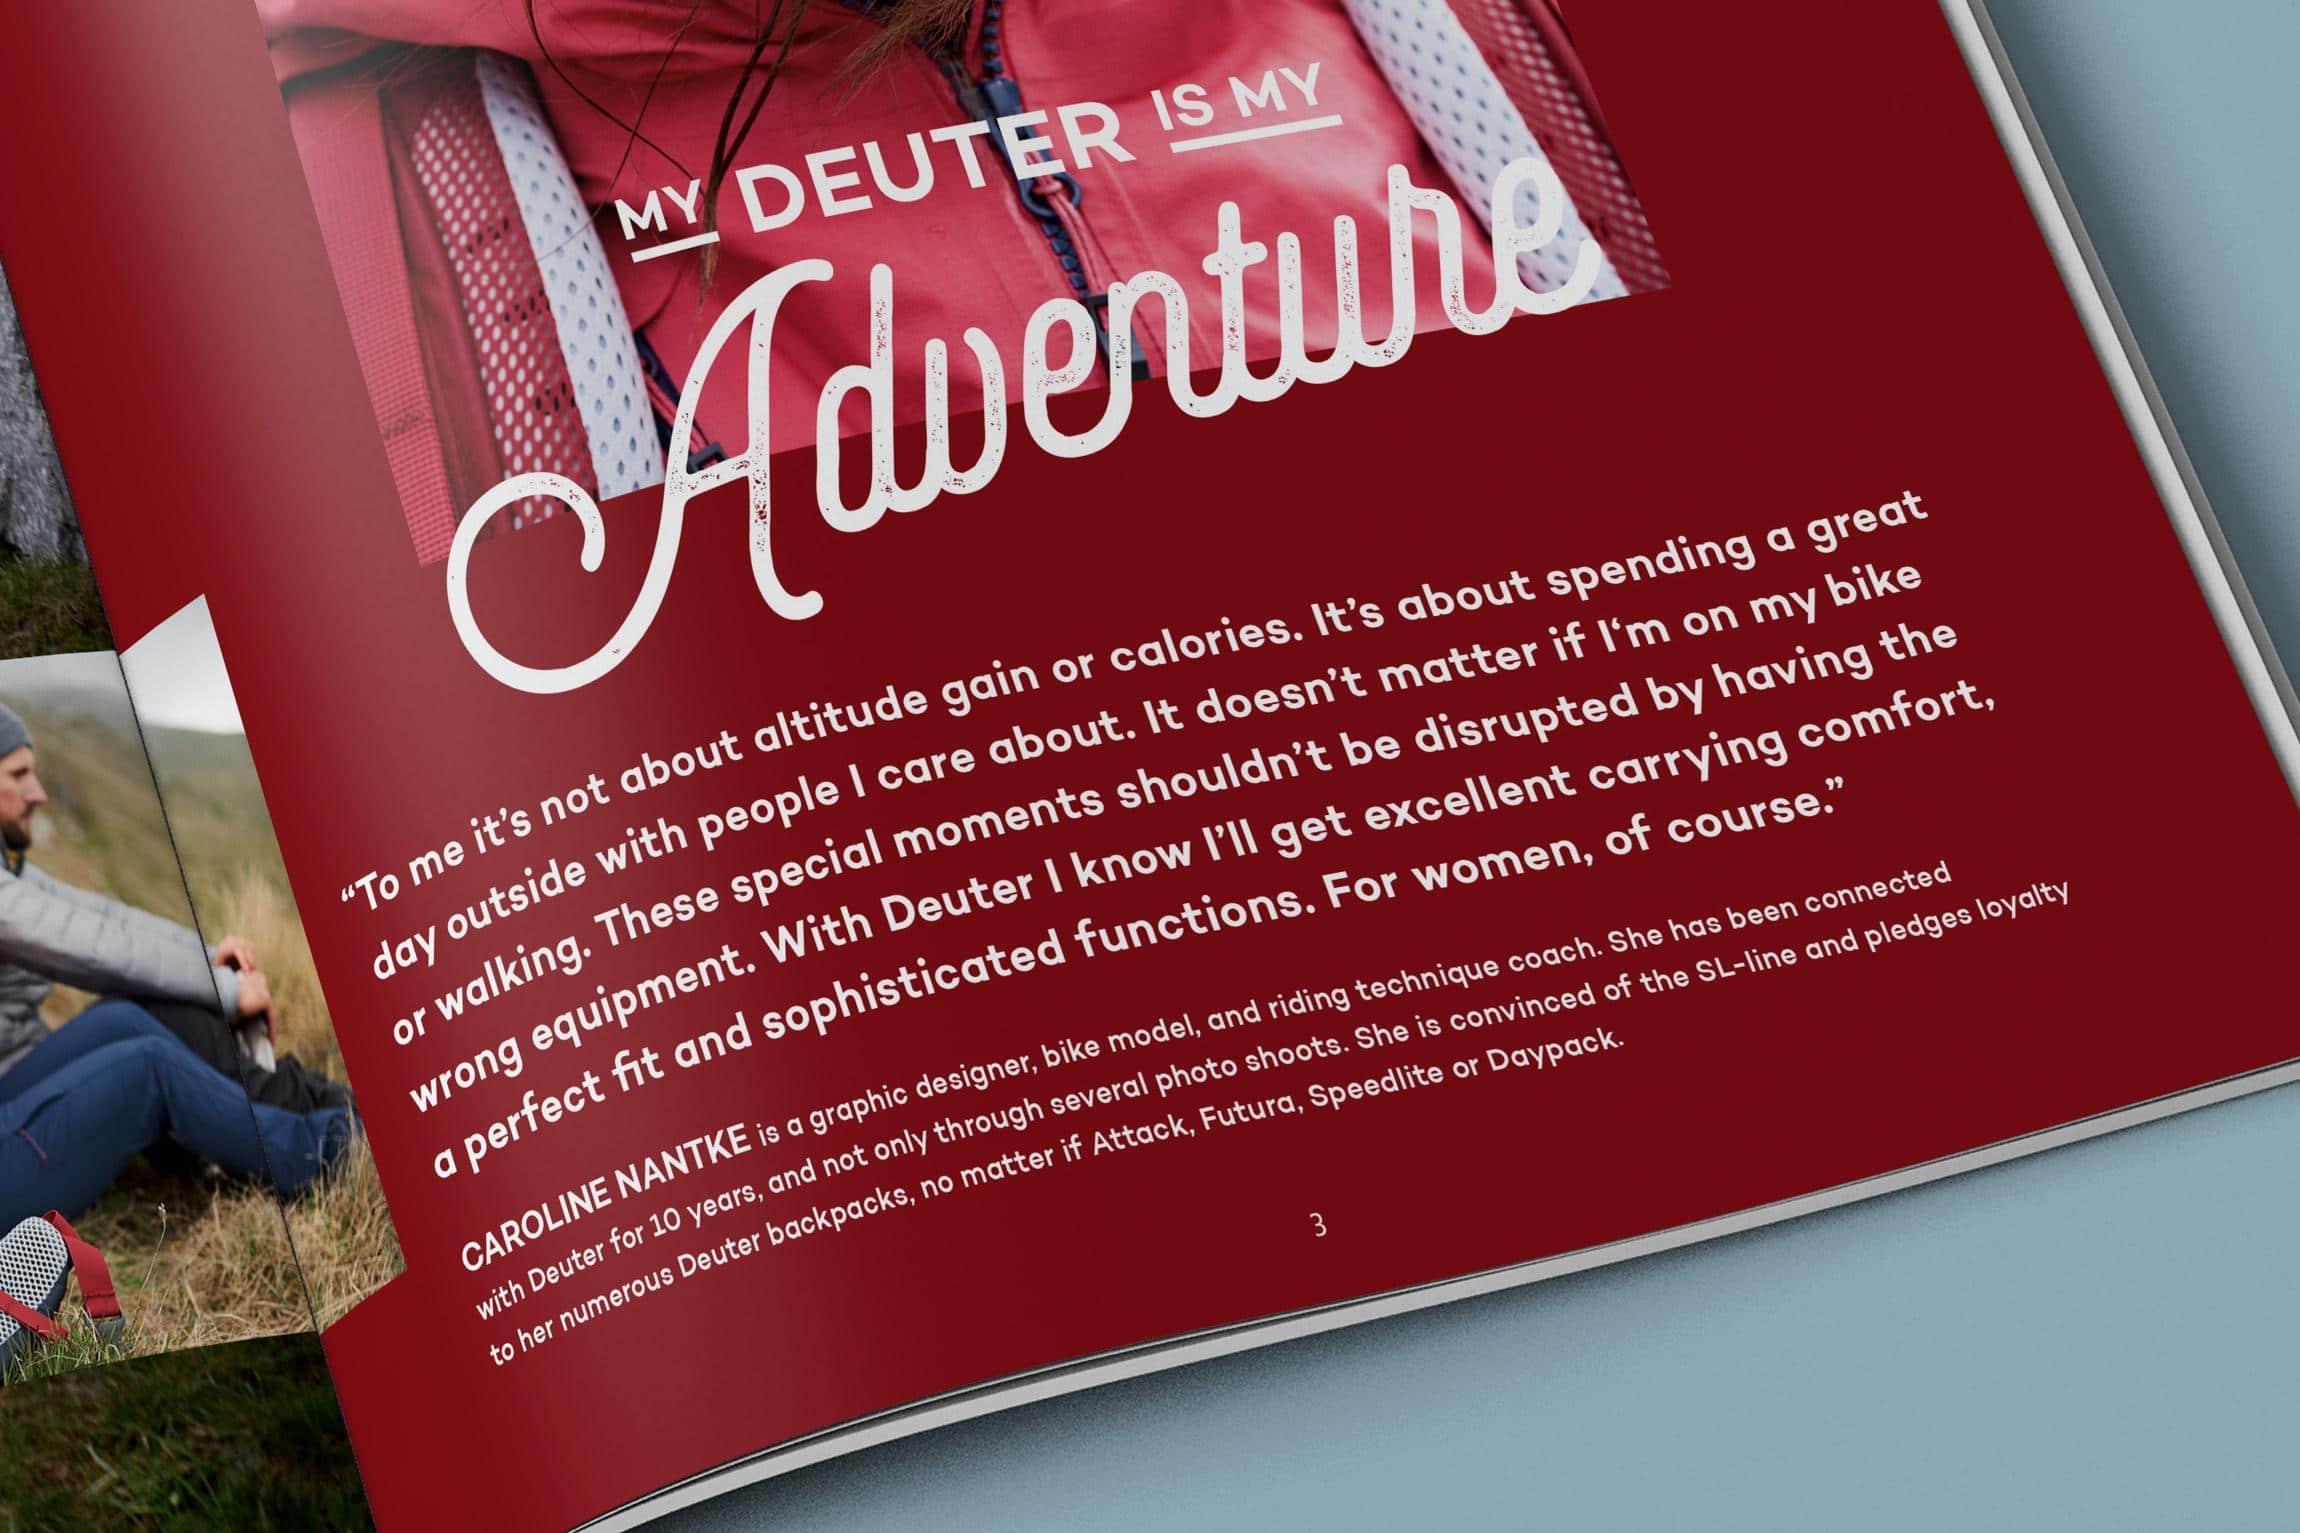 deuter-imagekampagne-magazin-02.jpg